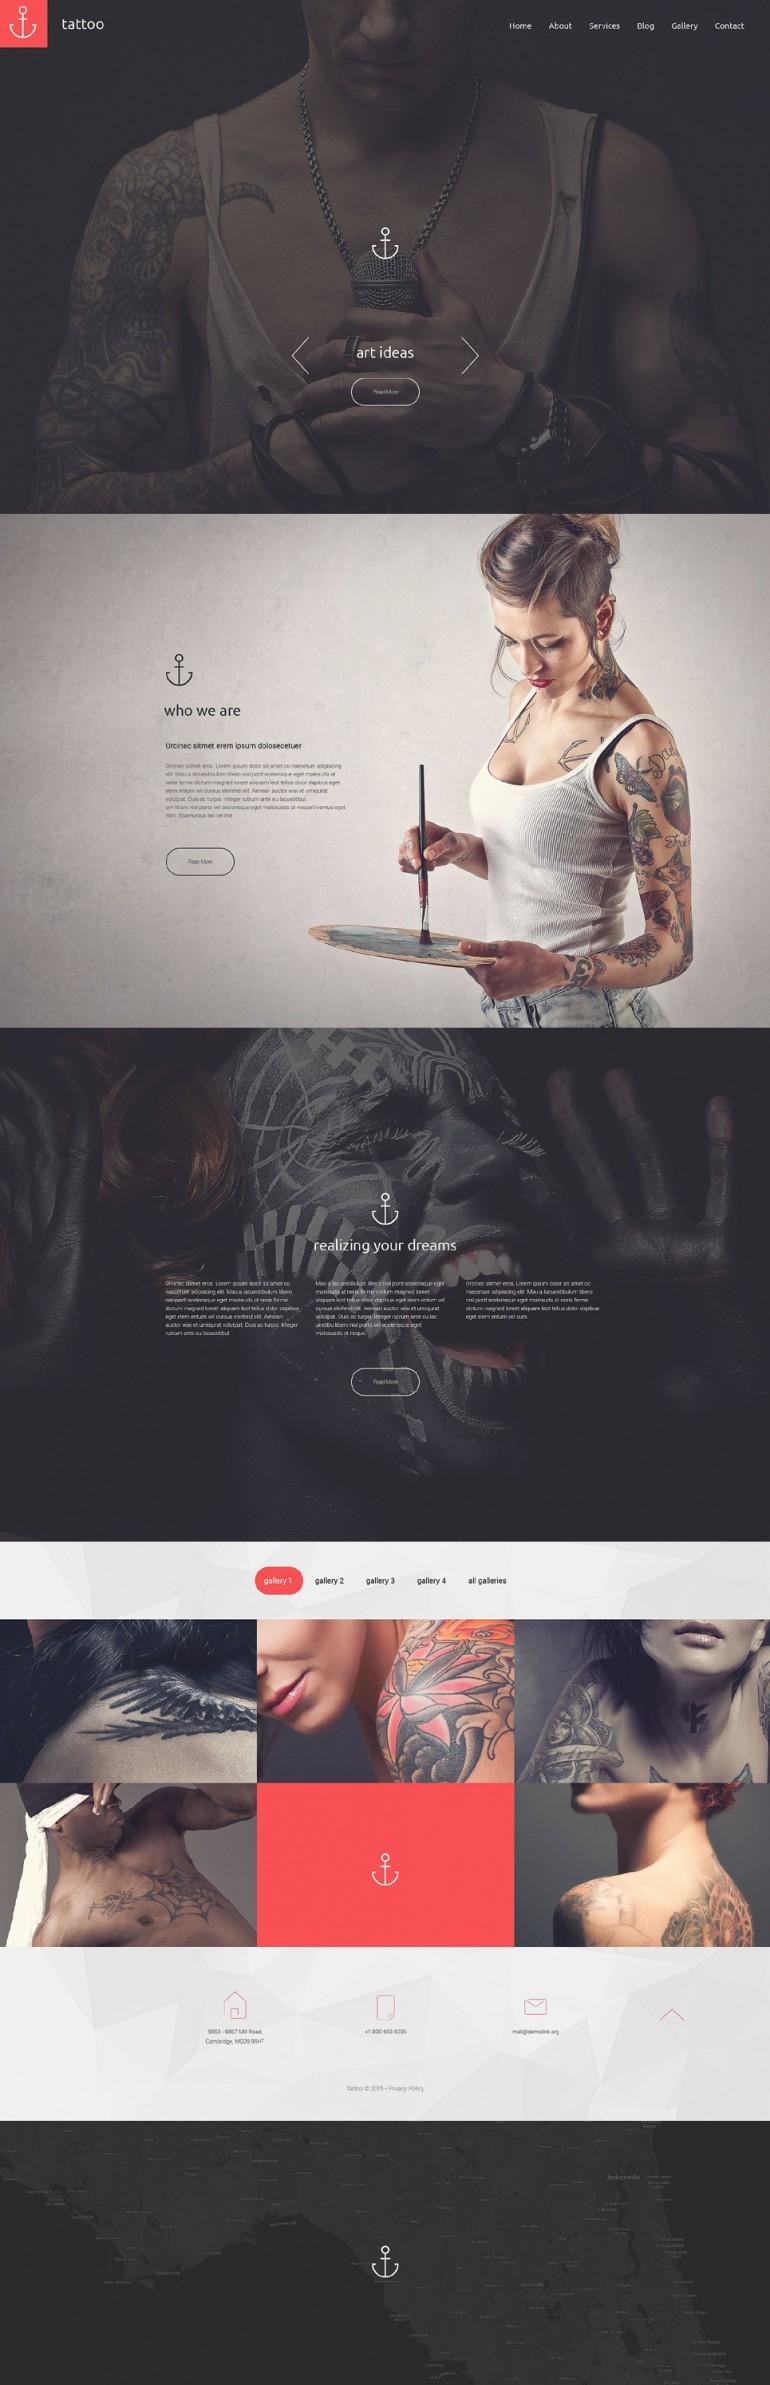 Tattoo Studio Website on Inspirationde